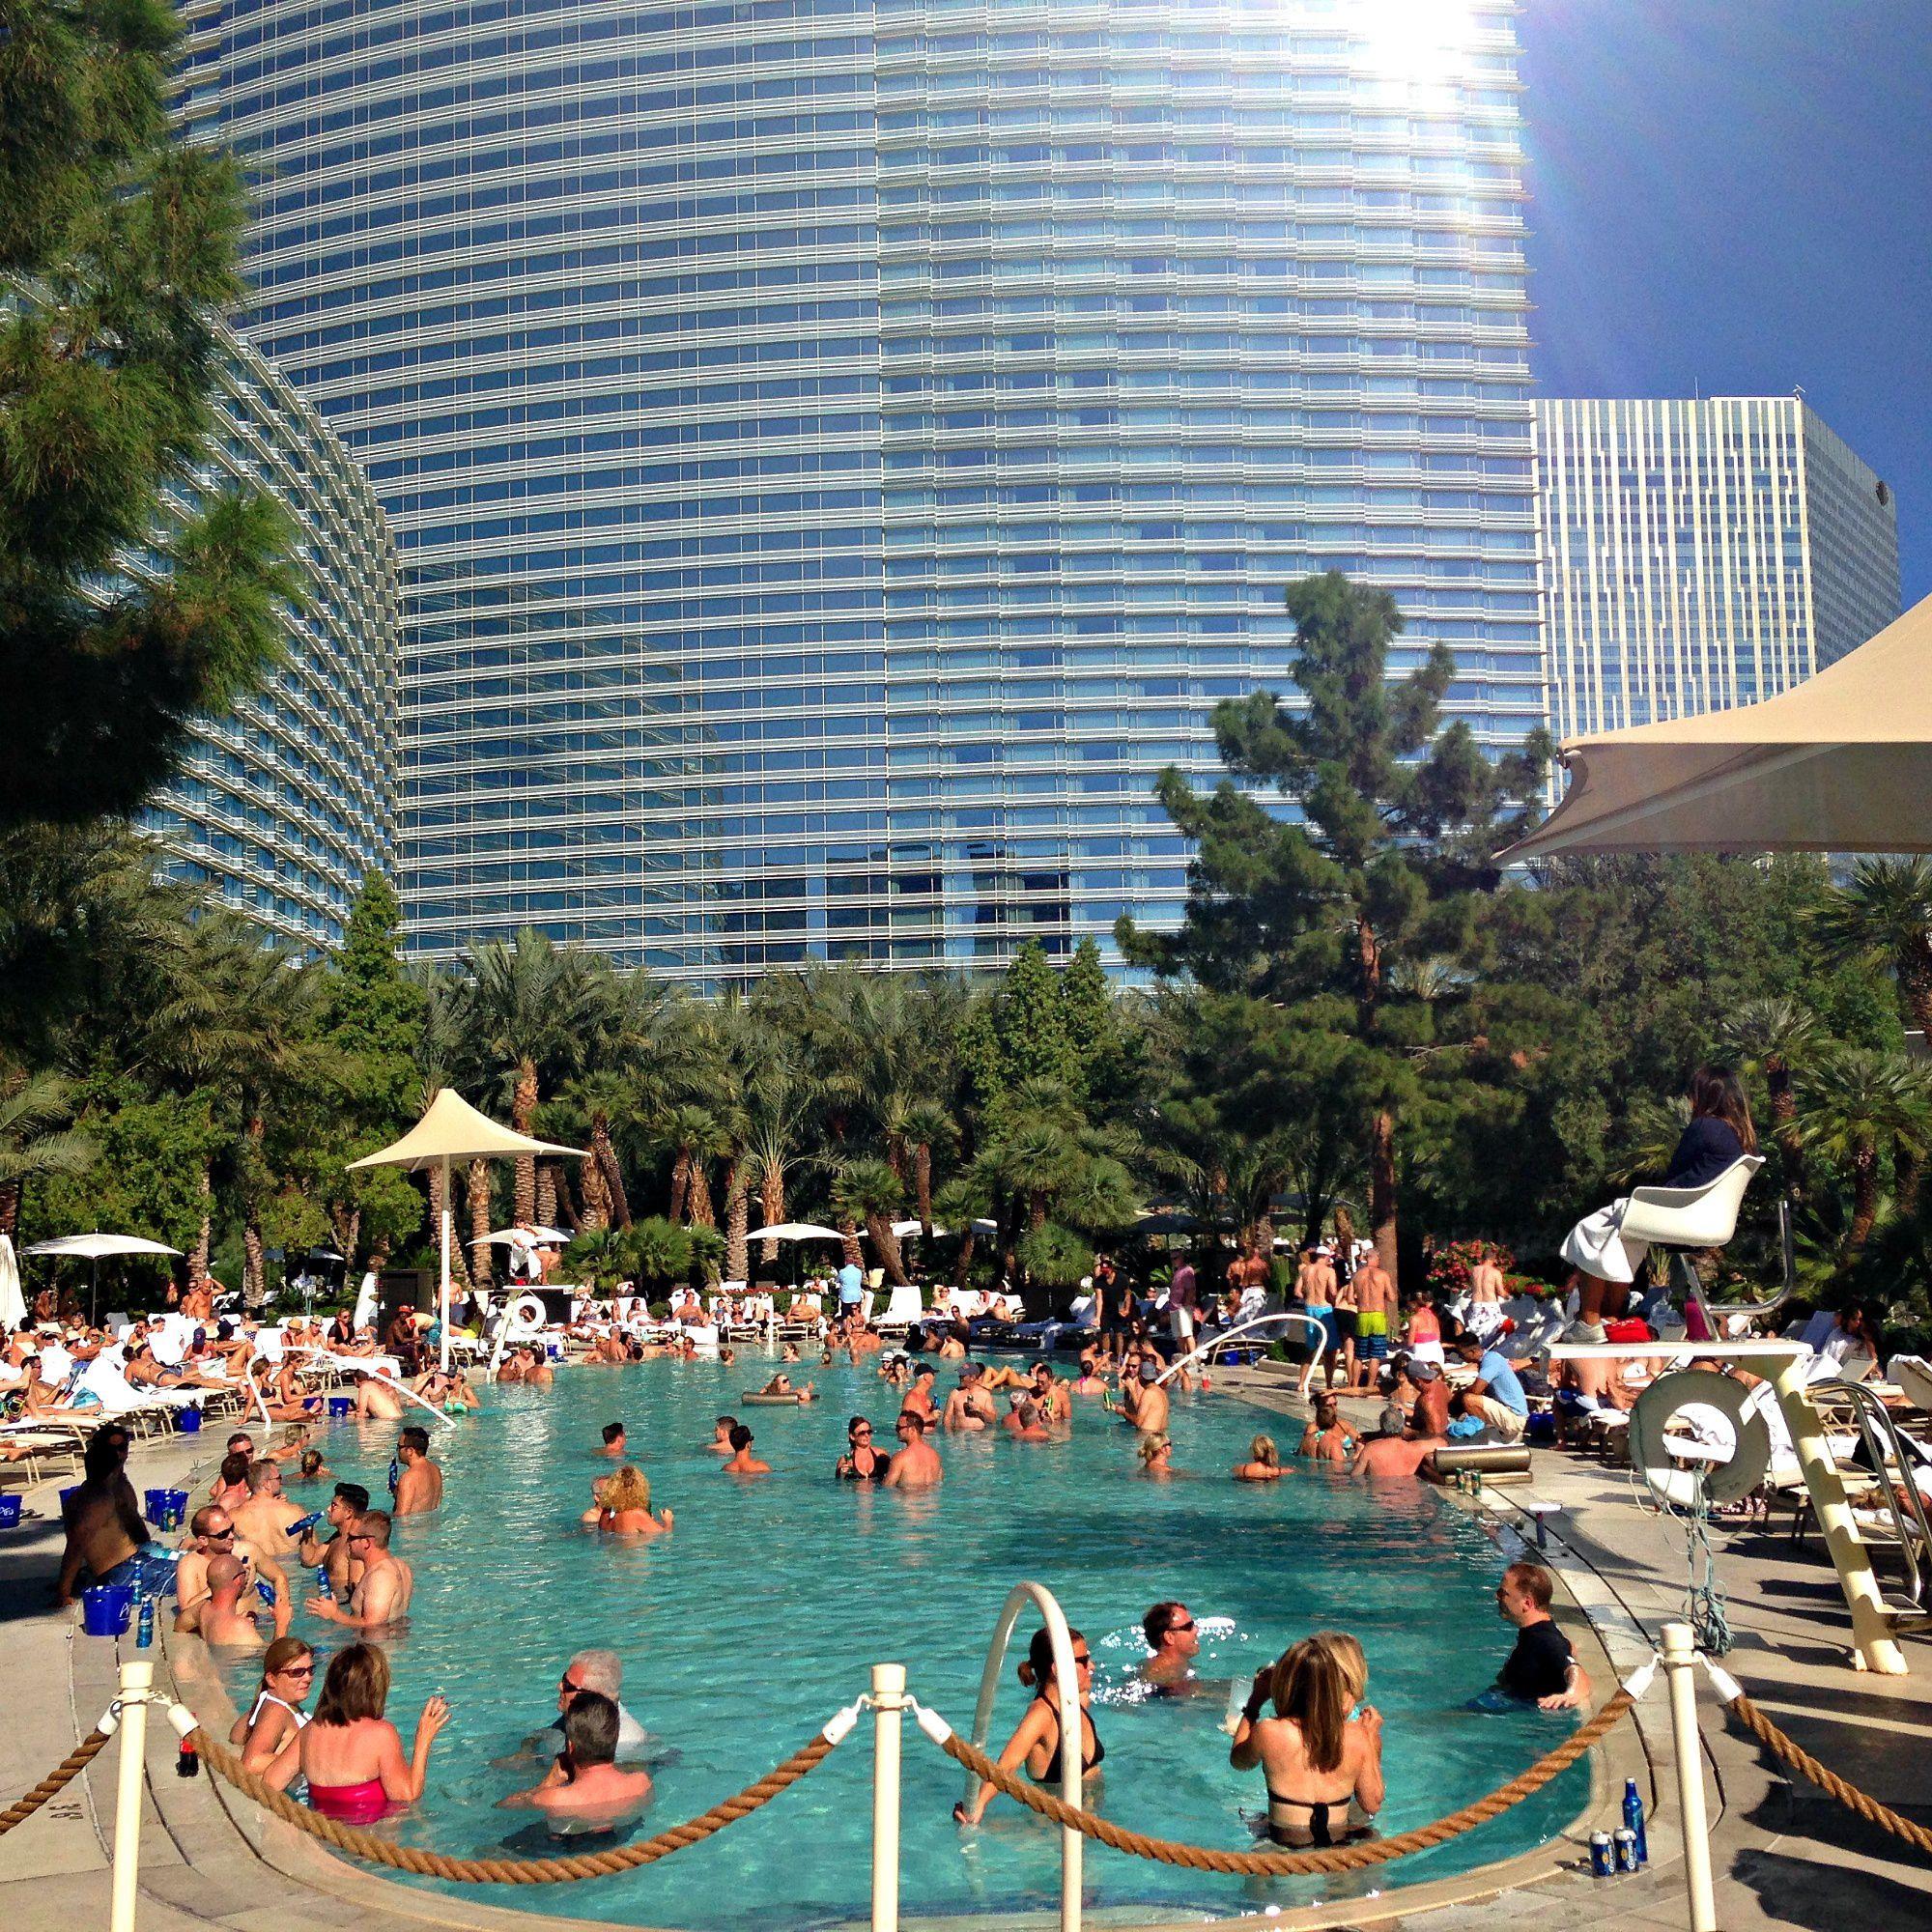 The Aria Hotel Casino Pool In Las Vegas Nevada Vegas Vacation Vegas Girls Trip Las Vegas Trip